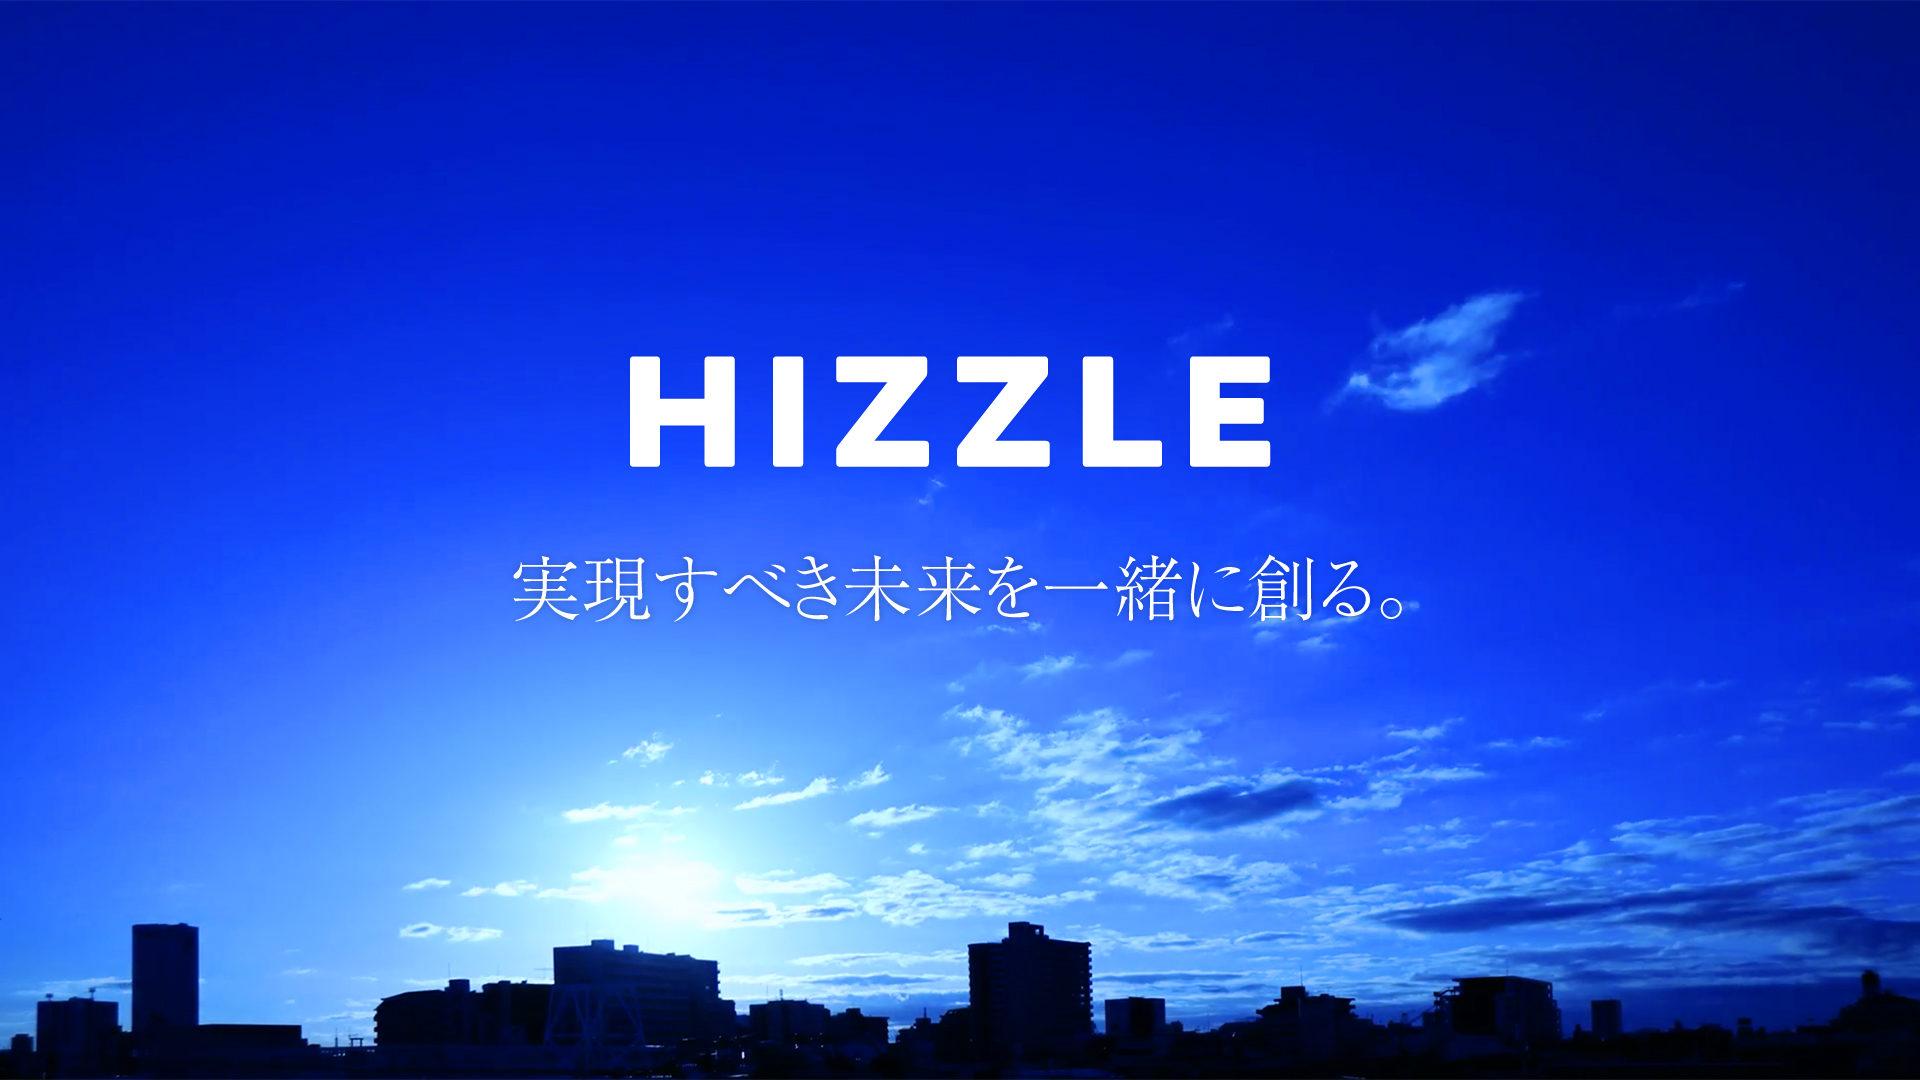 HIZZLE Corporate Branding